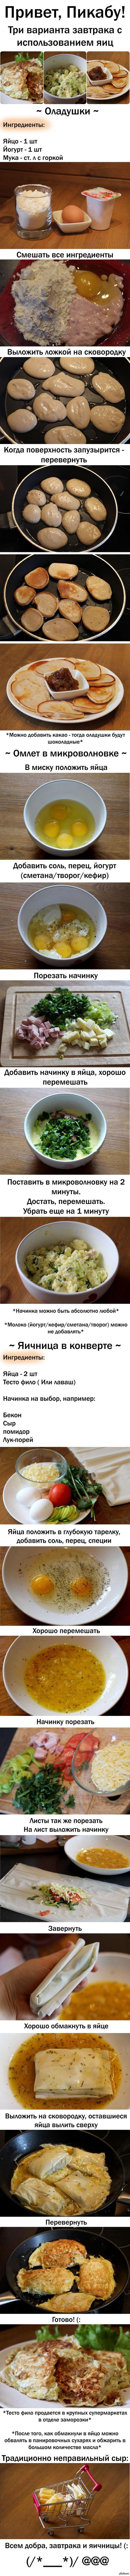 Три завтрака Длиннопост!  кулинария, рецепт, еда, длиннопост